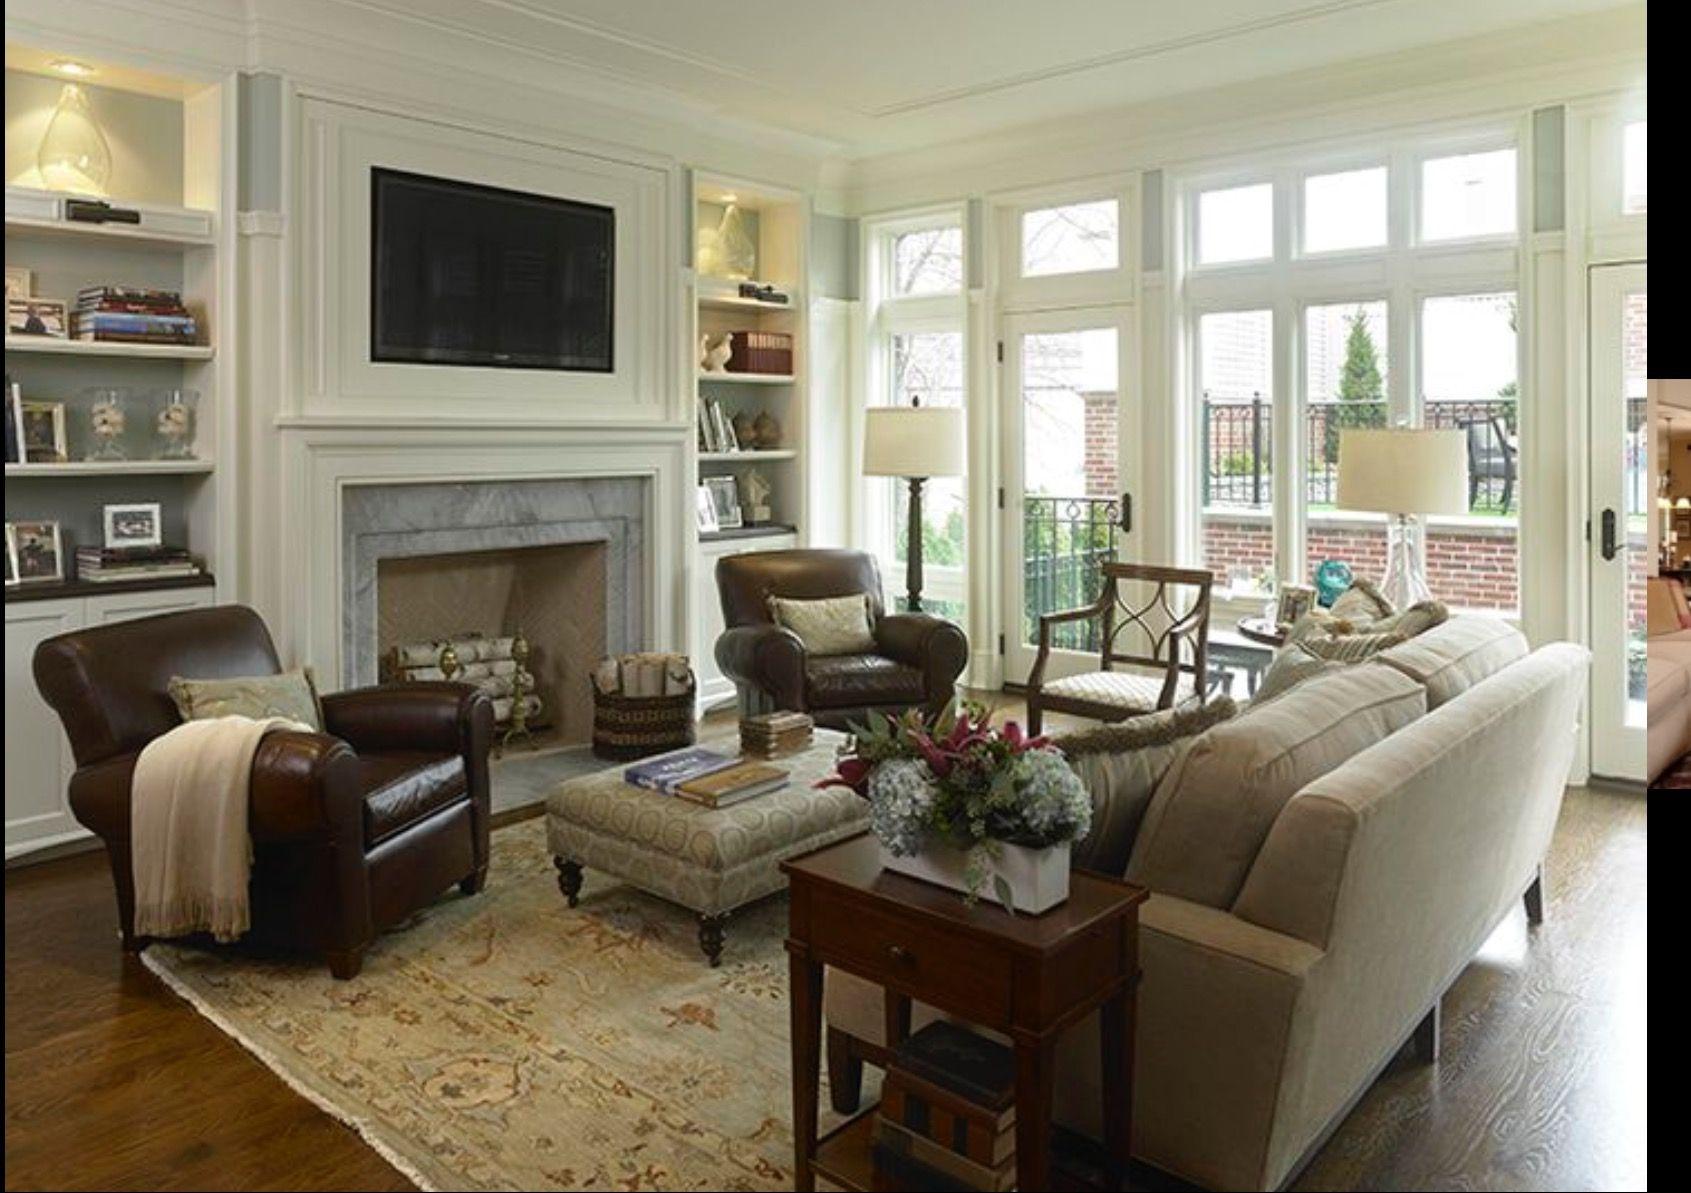 Pin by Dana on Remodeling | Living room setup, Family room ...